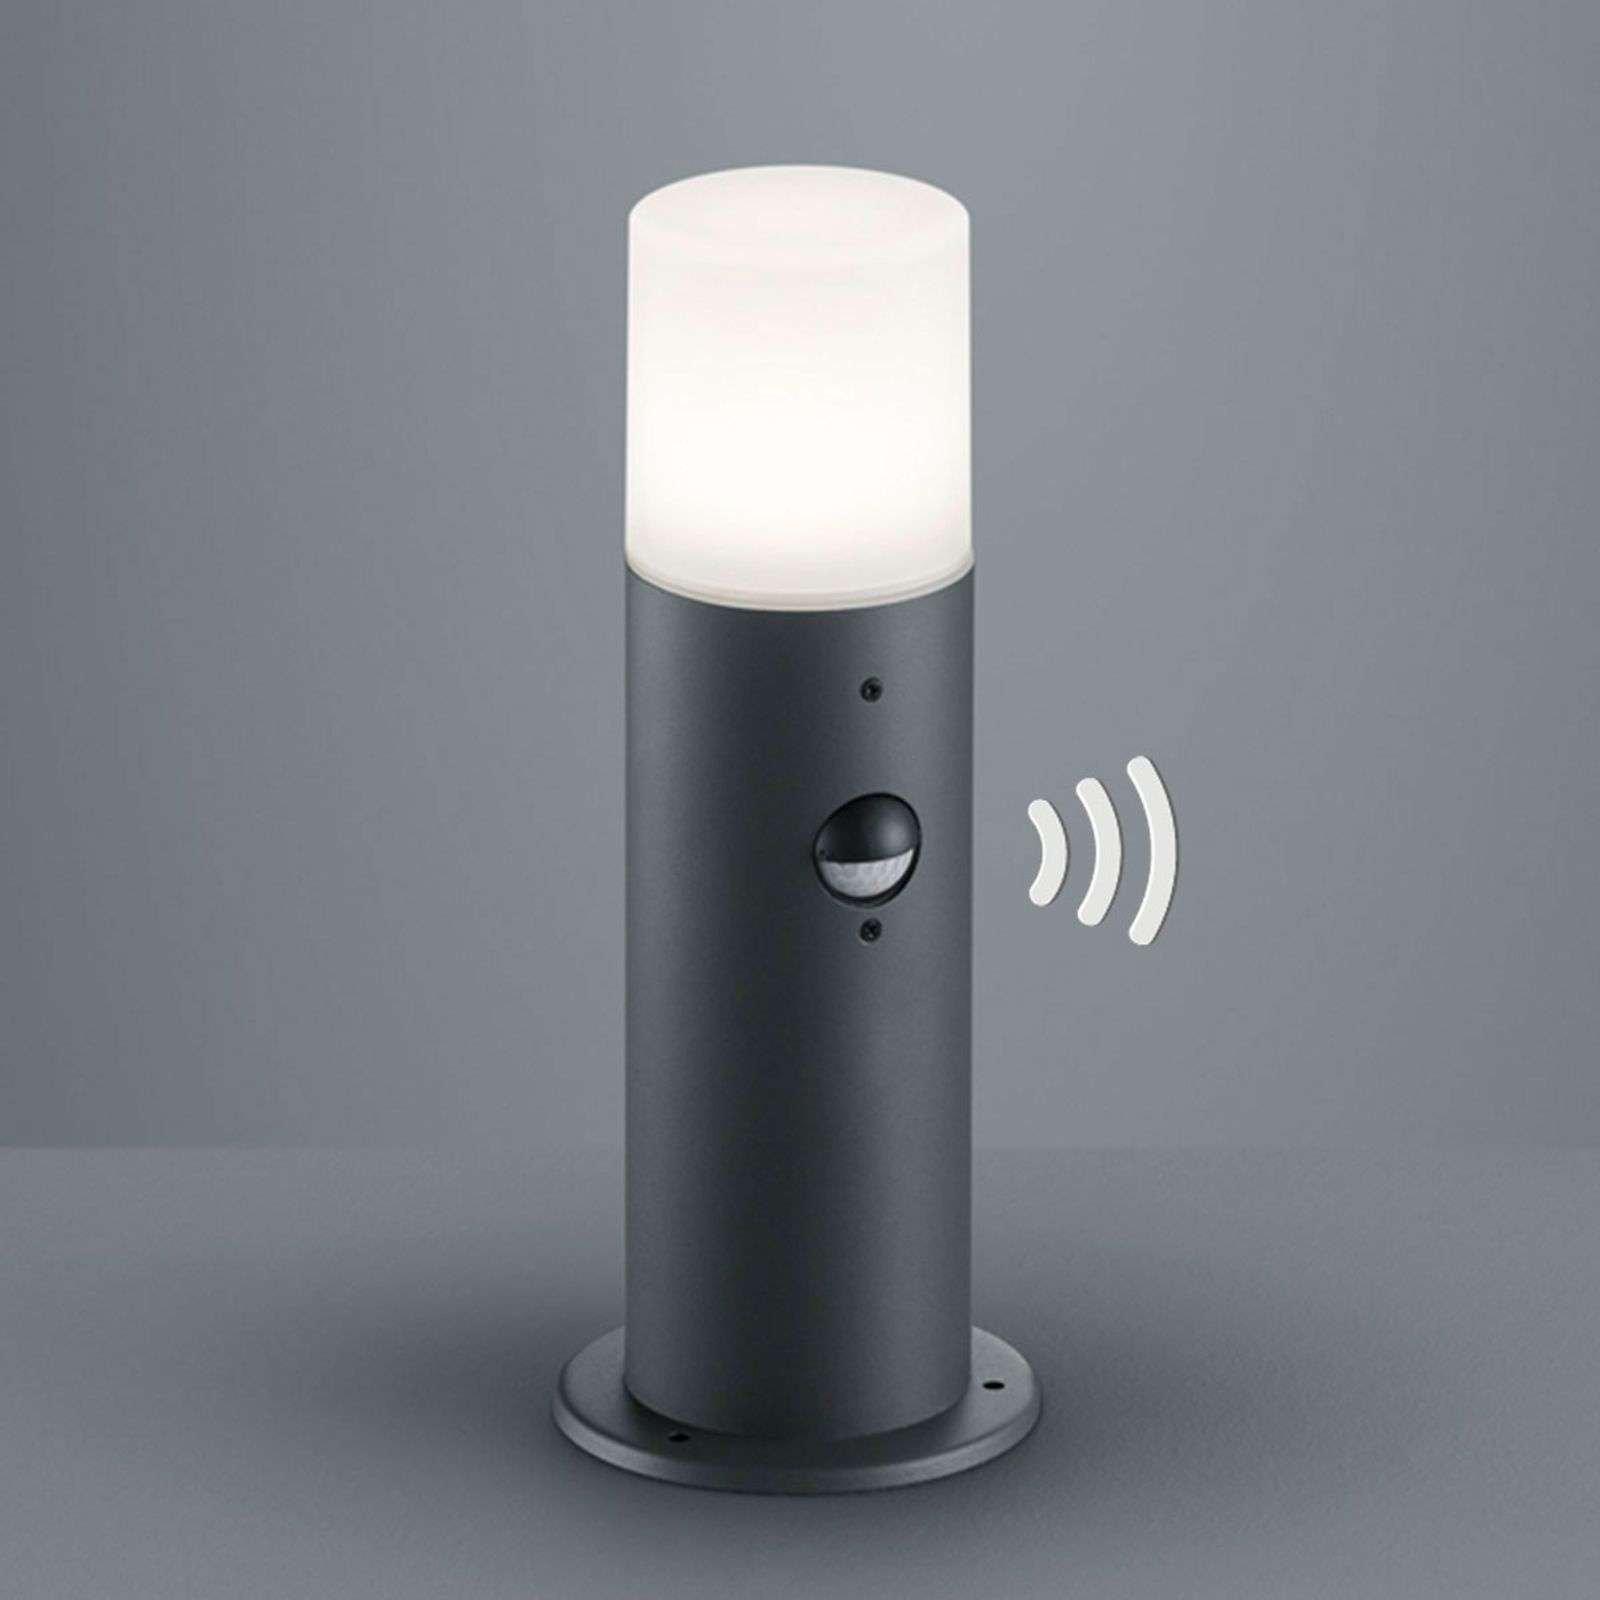 Practical Hoosic pillar light with sensor